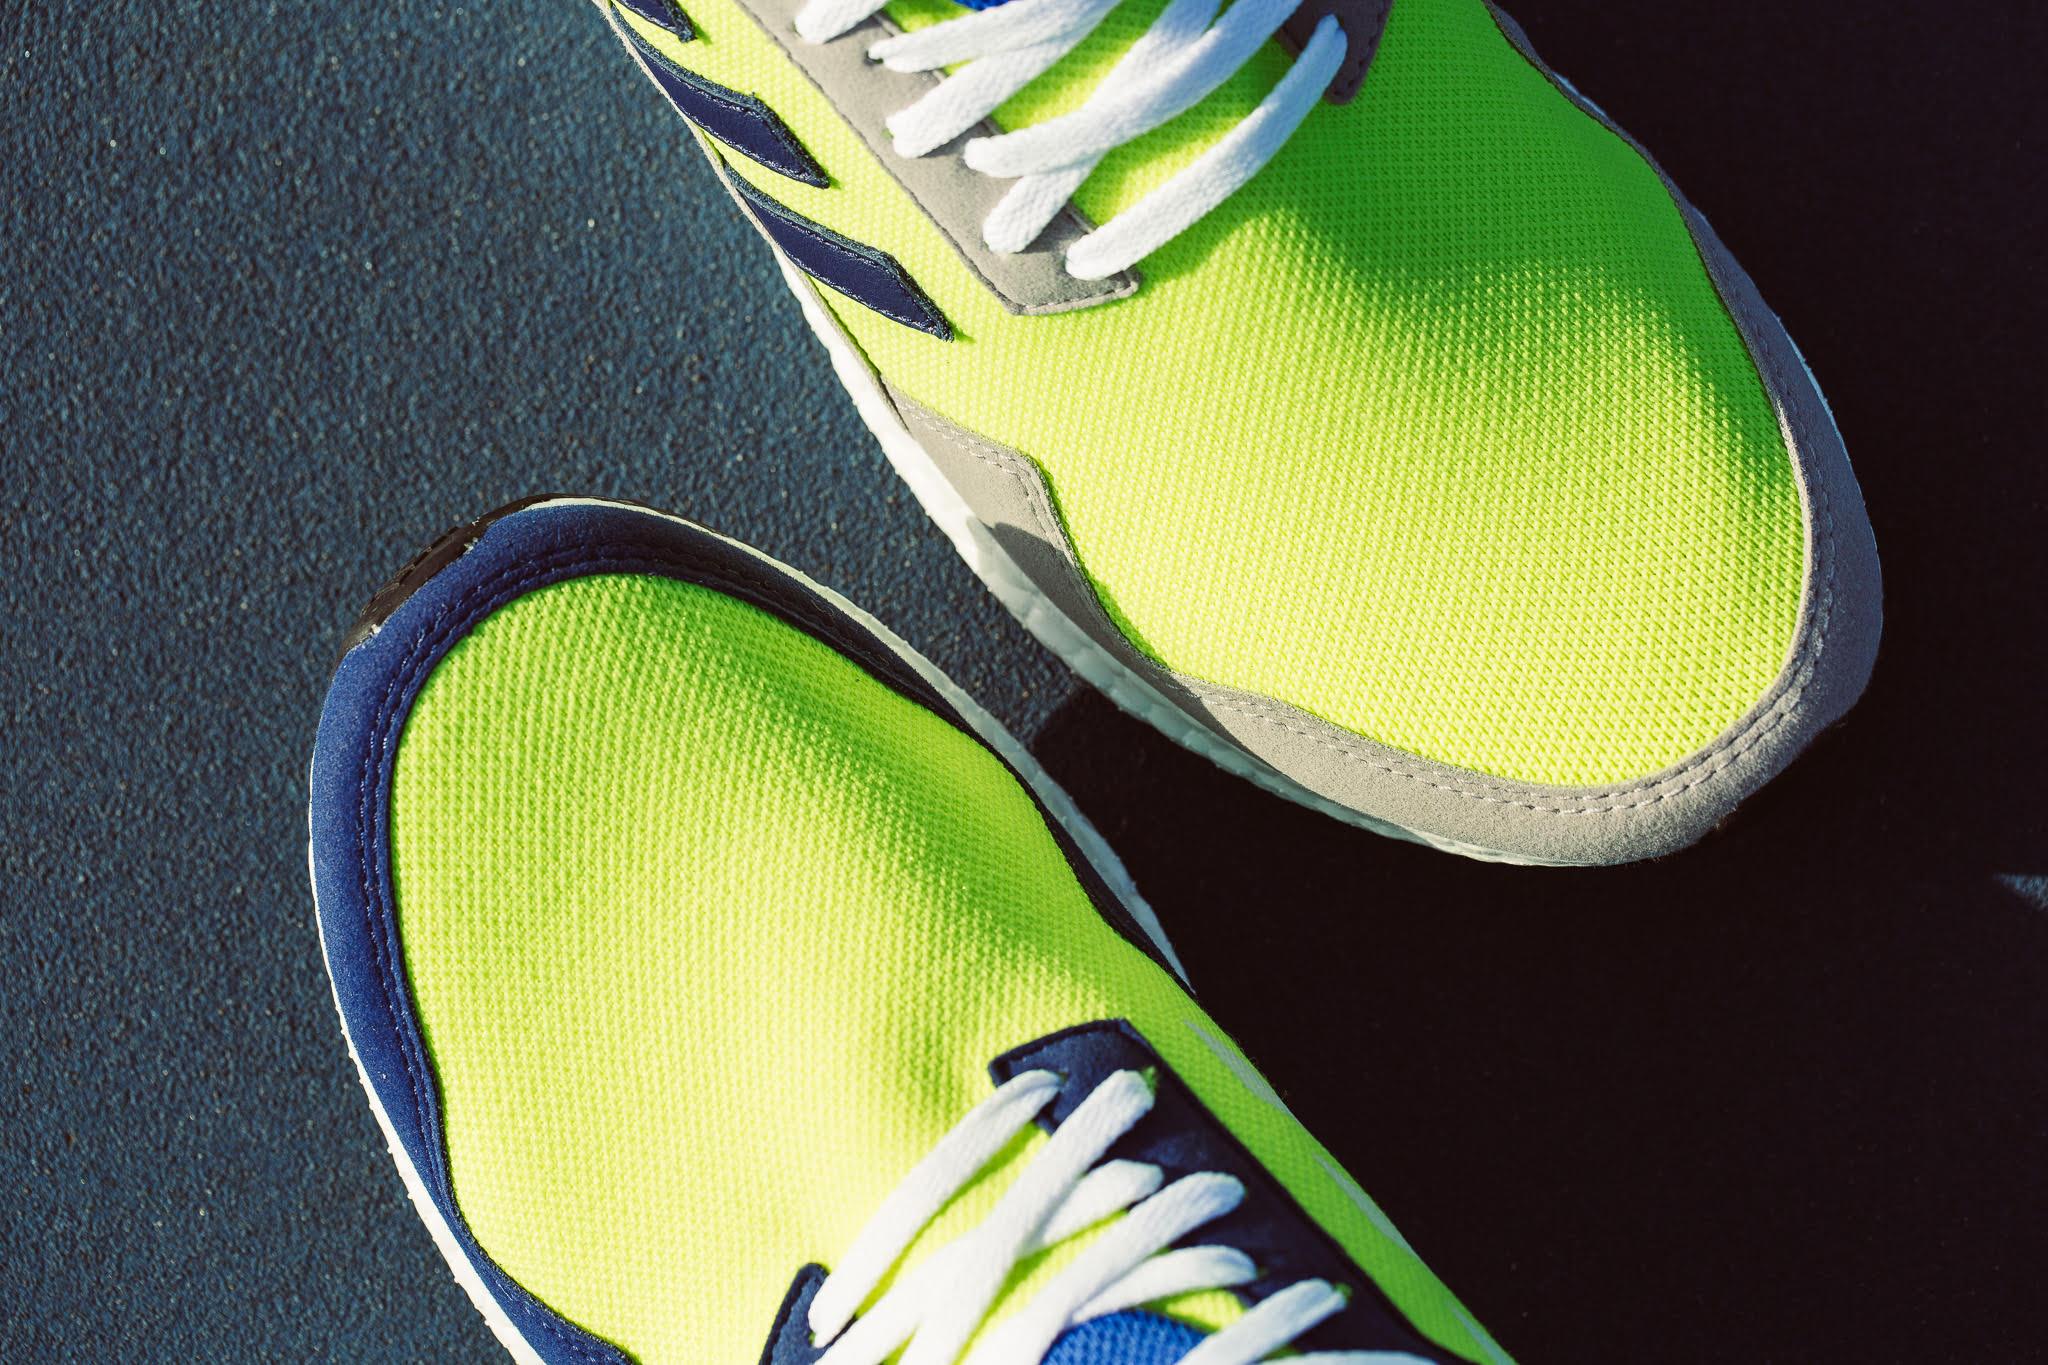 Adidas Consortium Ultra Boost Mid Prototype Release Date BD7399 Toe